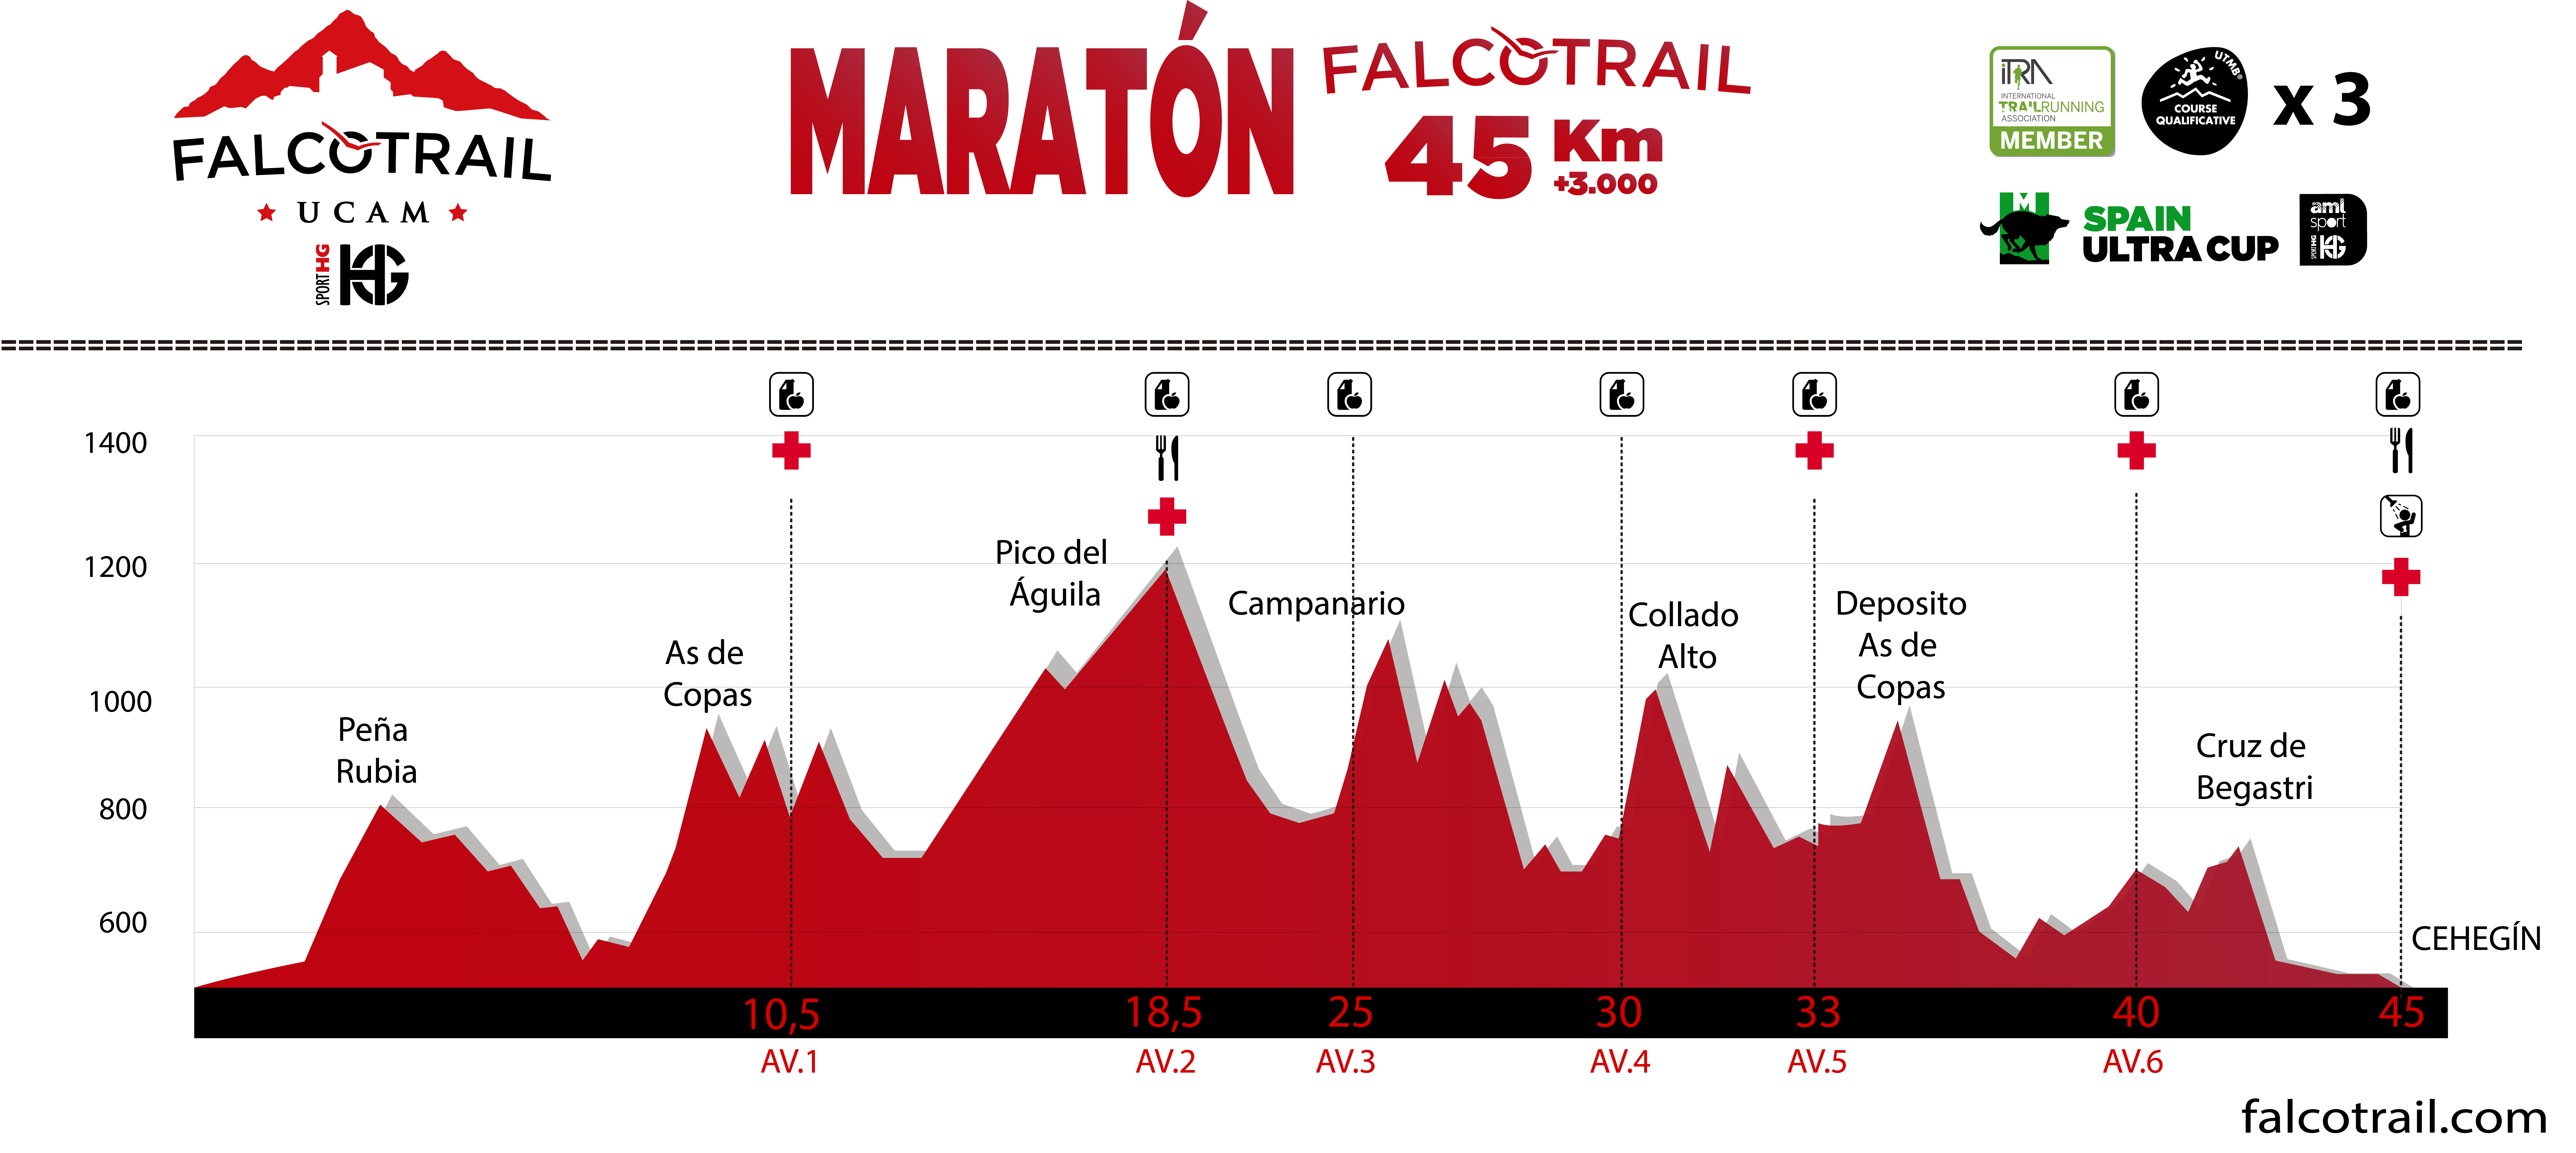 perfil-falcotrail-maraton-45